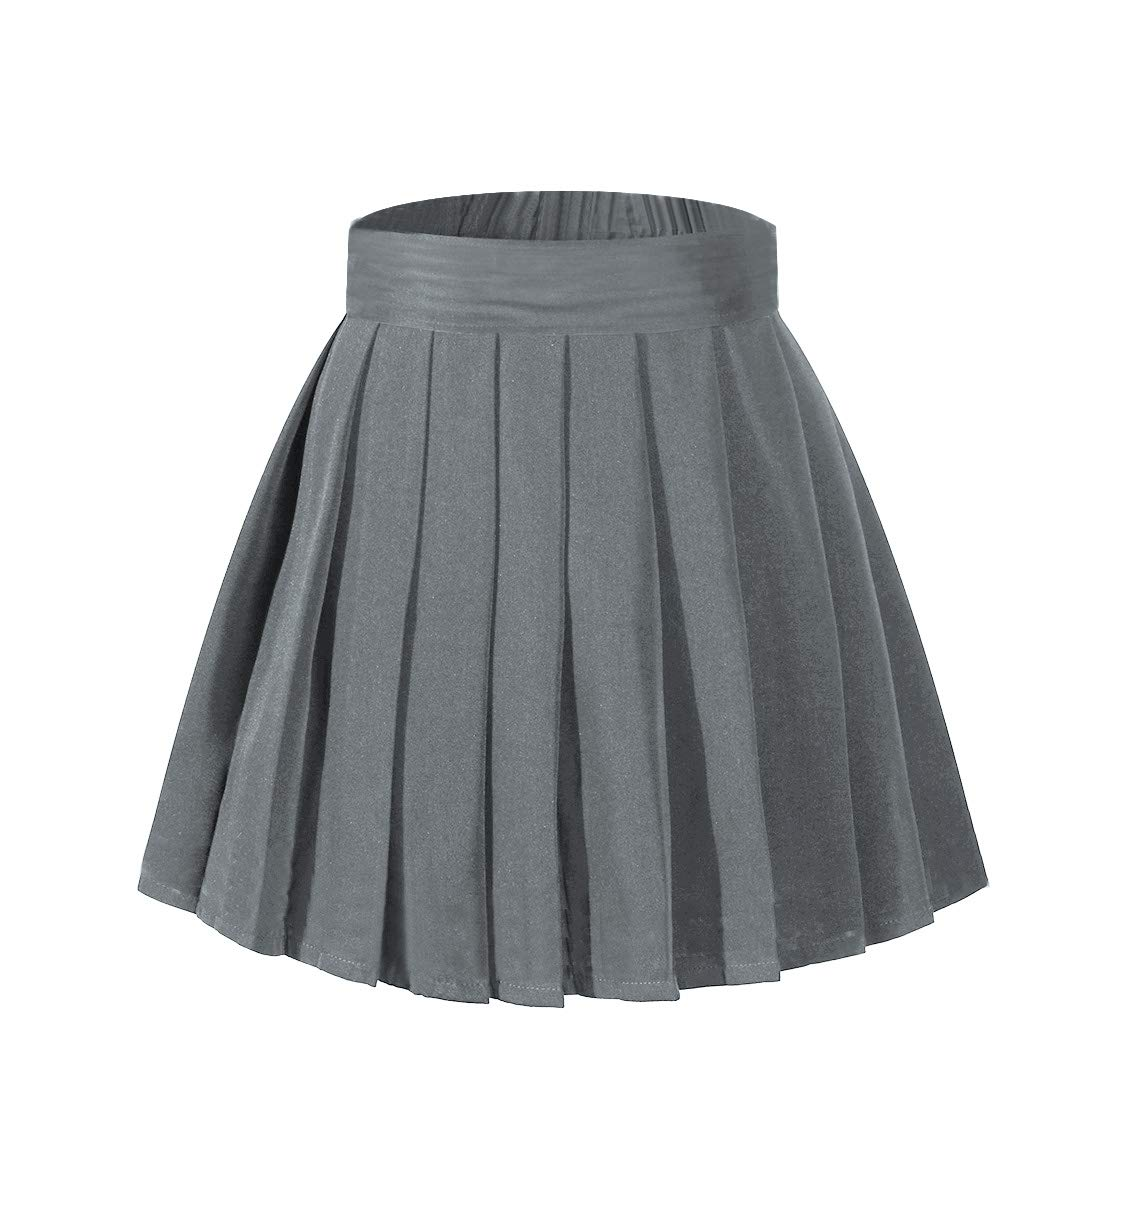 Beautifulfashionlife Women's Plus Size High Waist School Uniform Mini Skirt Dark Grey,2XL by Beautifulfashionlife